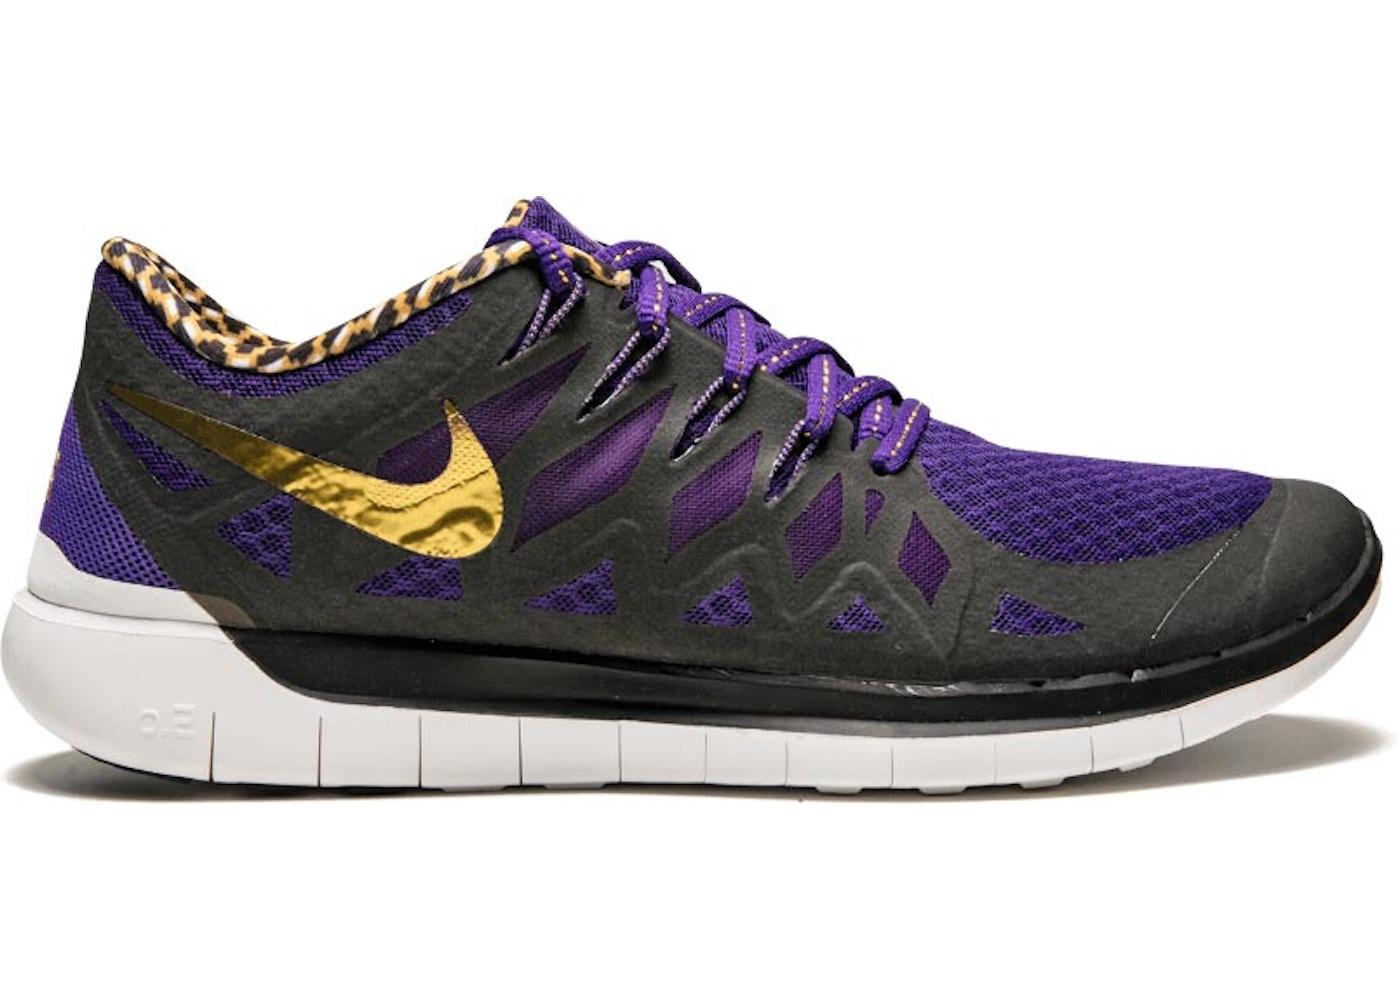 grande capital Impuro  Nike Free 5.0 Doernbecher (2014) - 725566-580